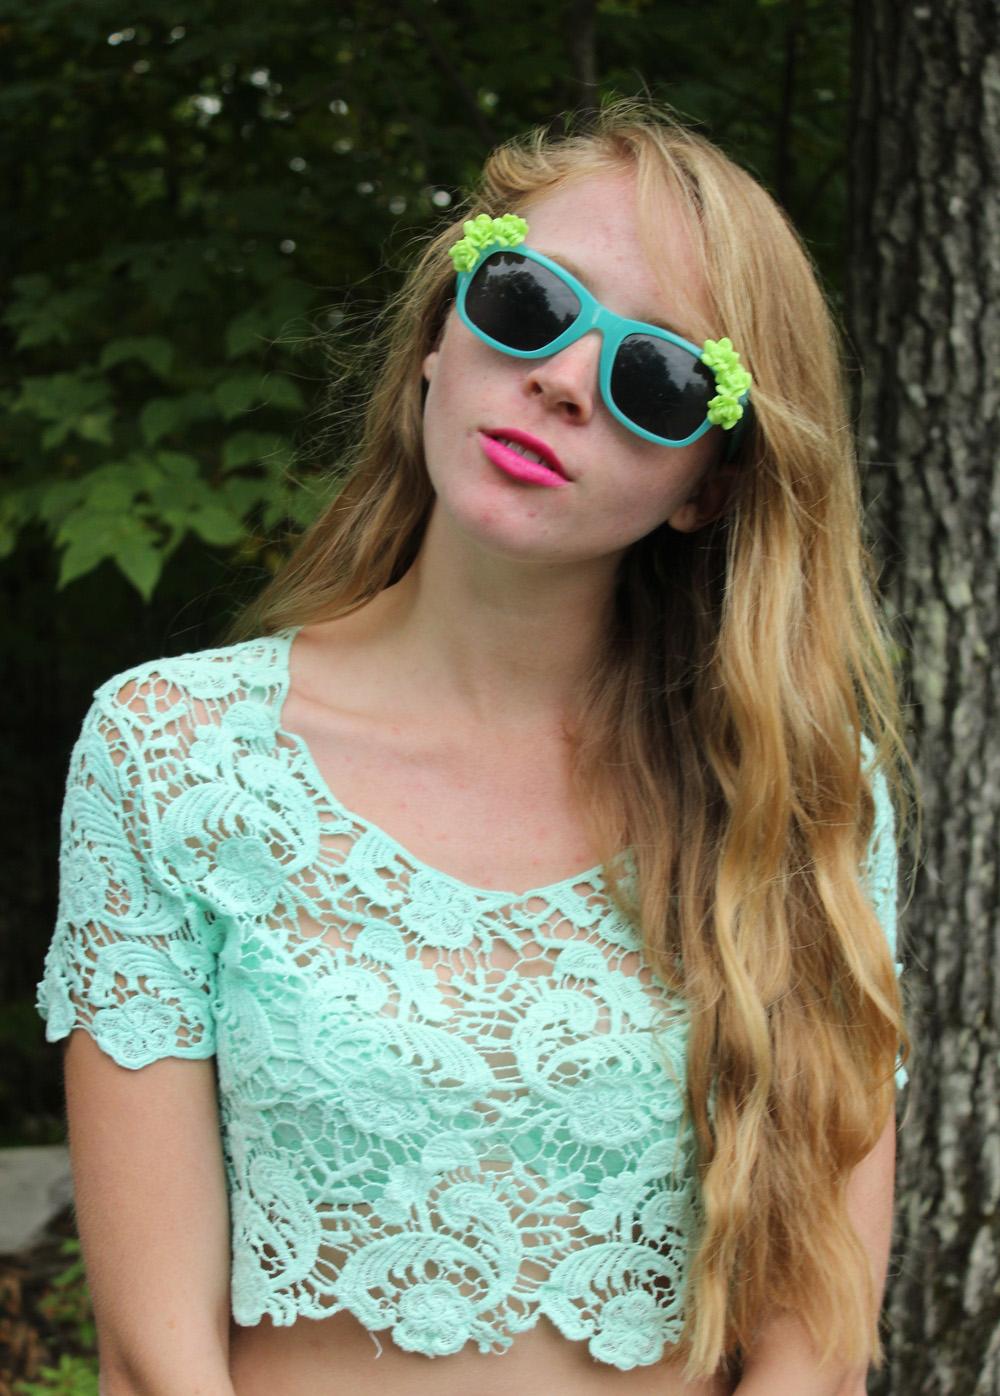 mint shirt lace and sunglasses